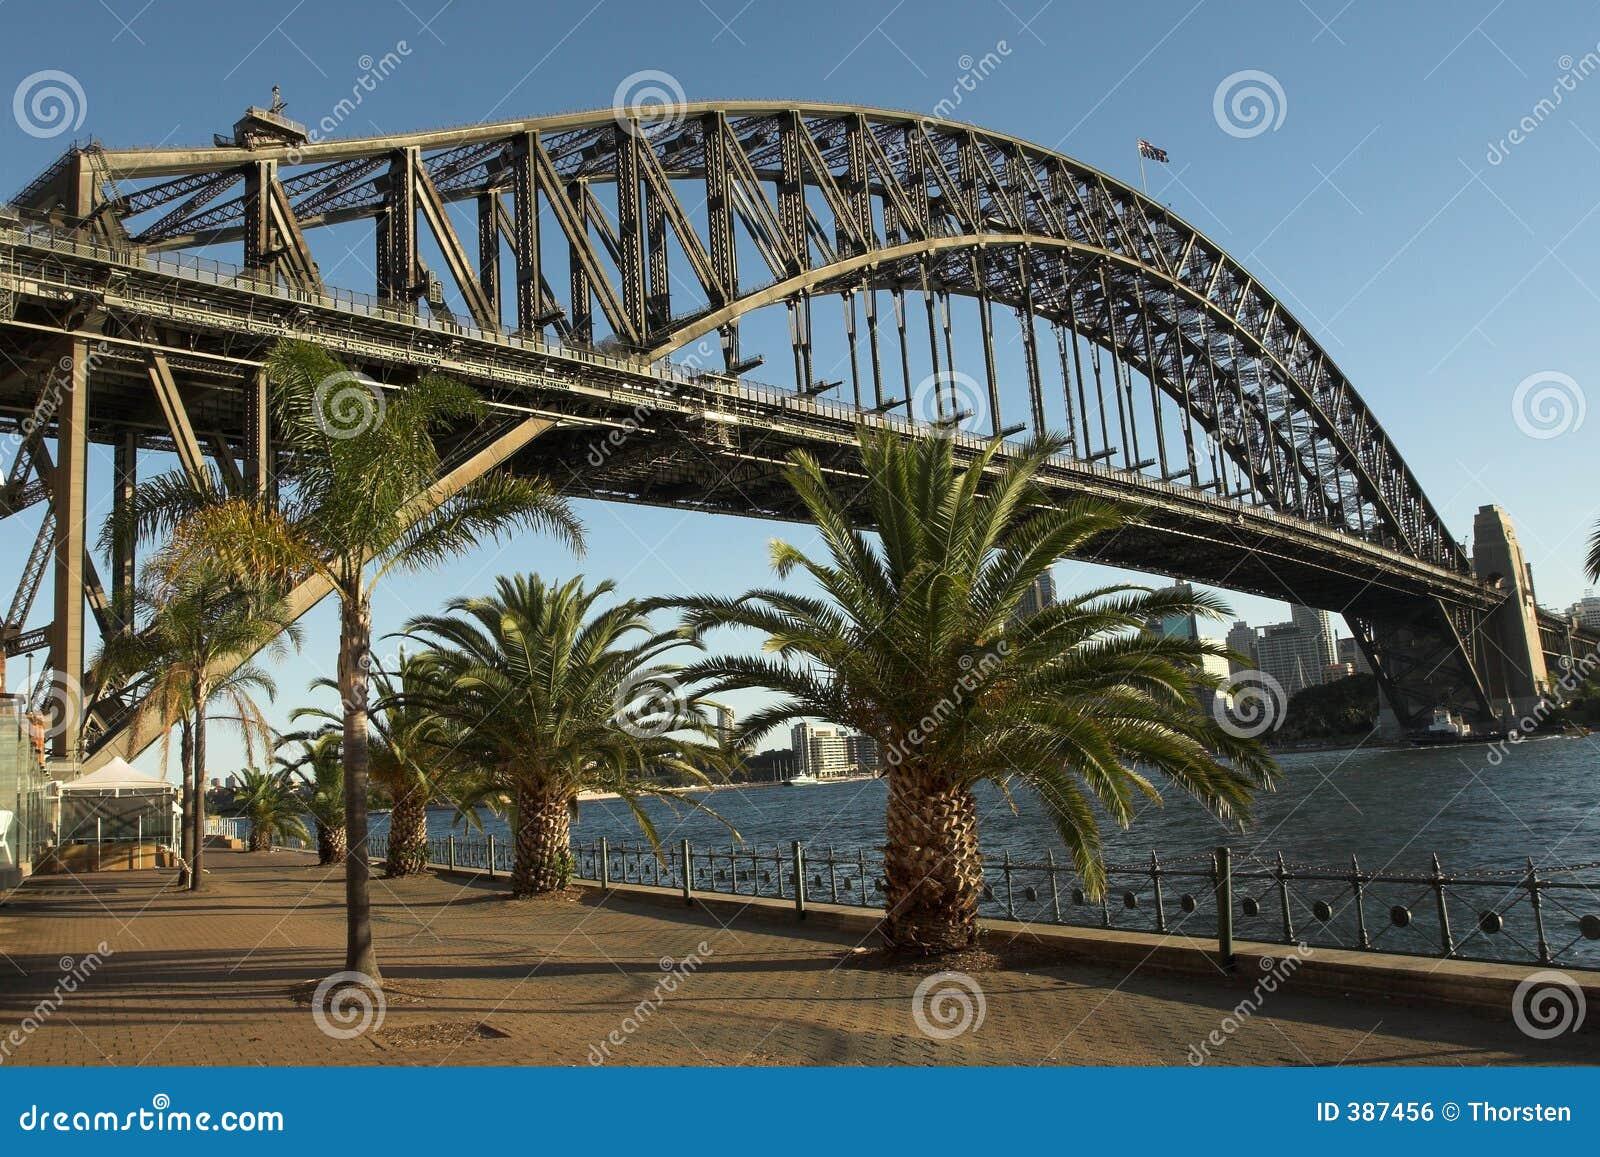 Date palms in Sydney